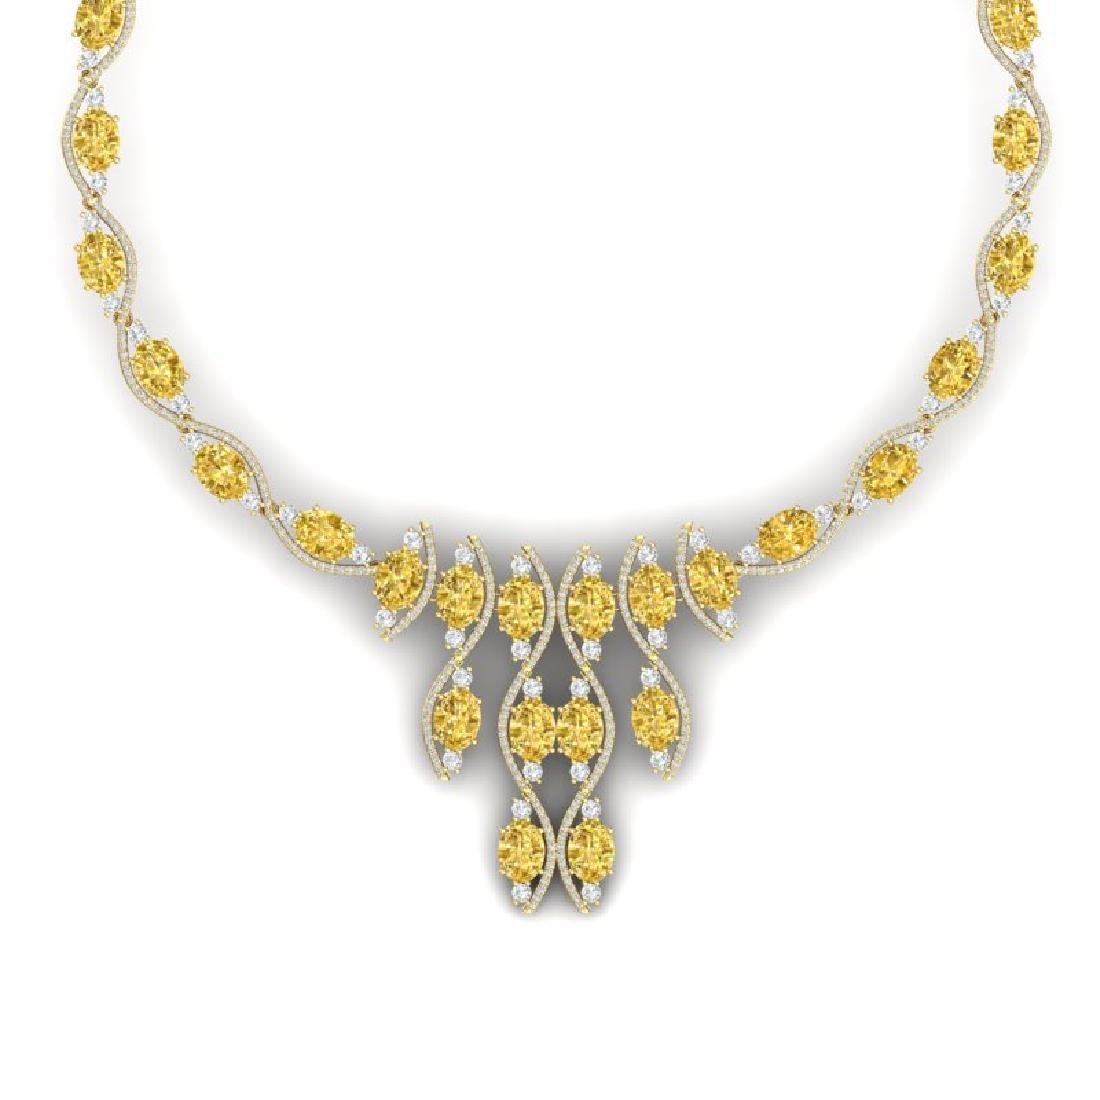 64.04 CTW Royalty Canary Citrine & VS Diamond Necklace - 2